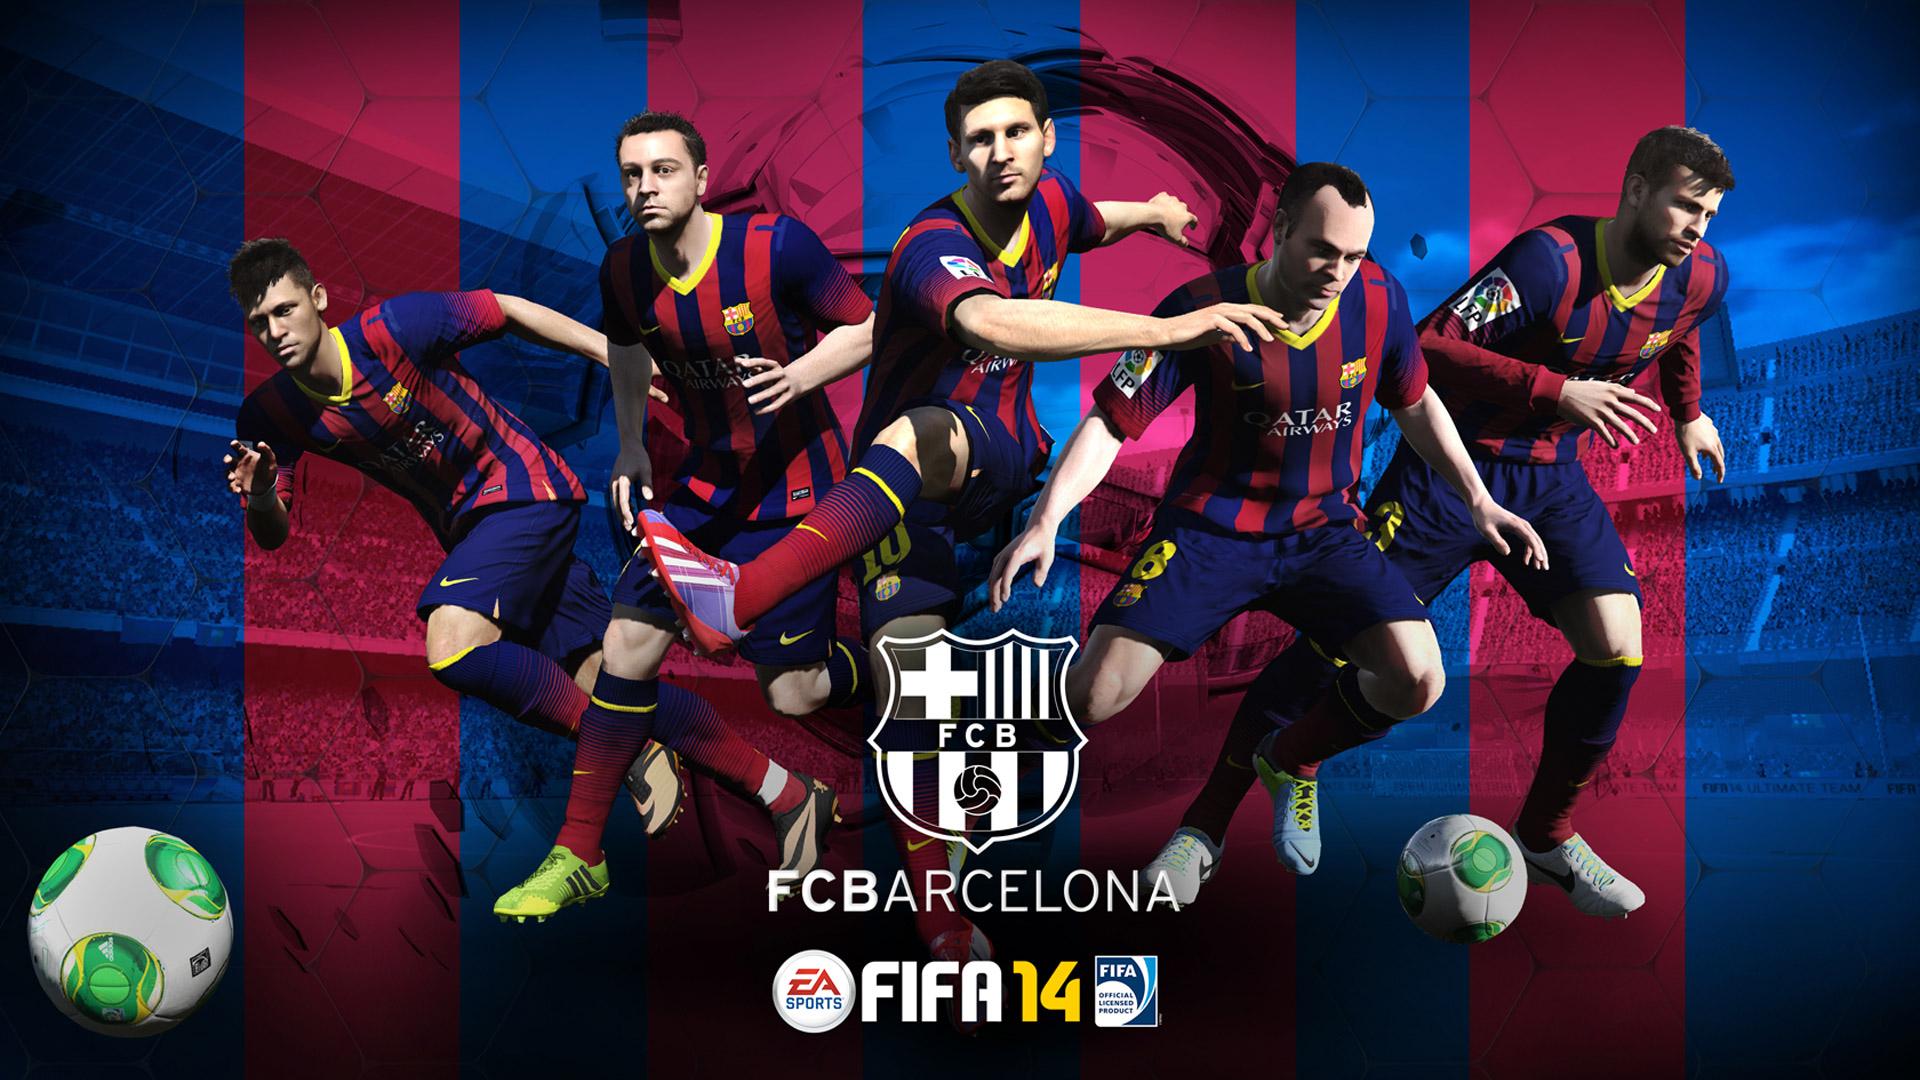 FIFA 14 Wallpaper in 1920x1080